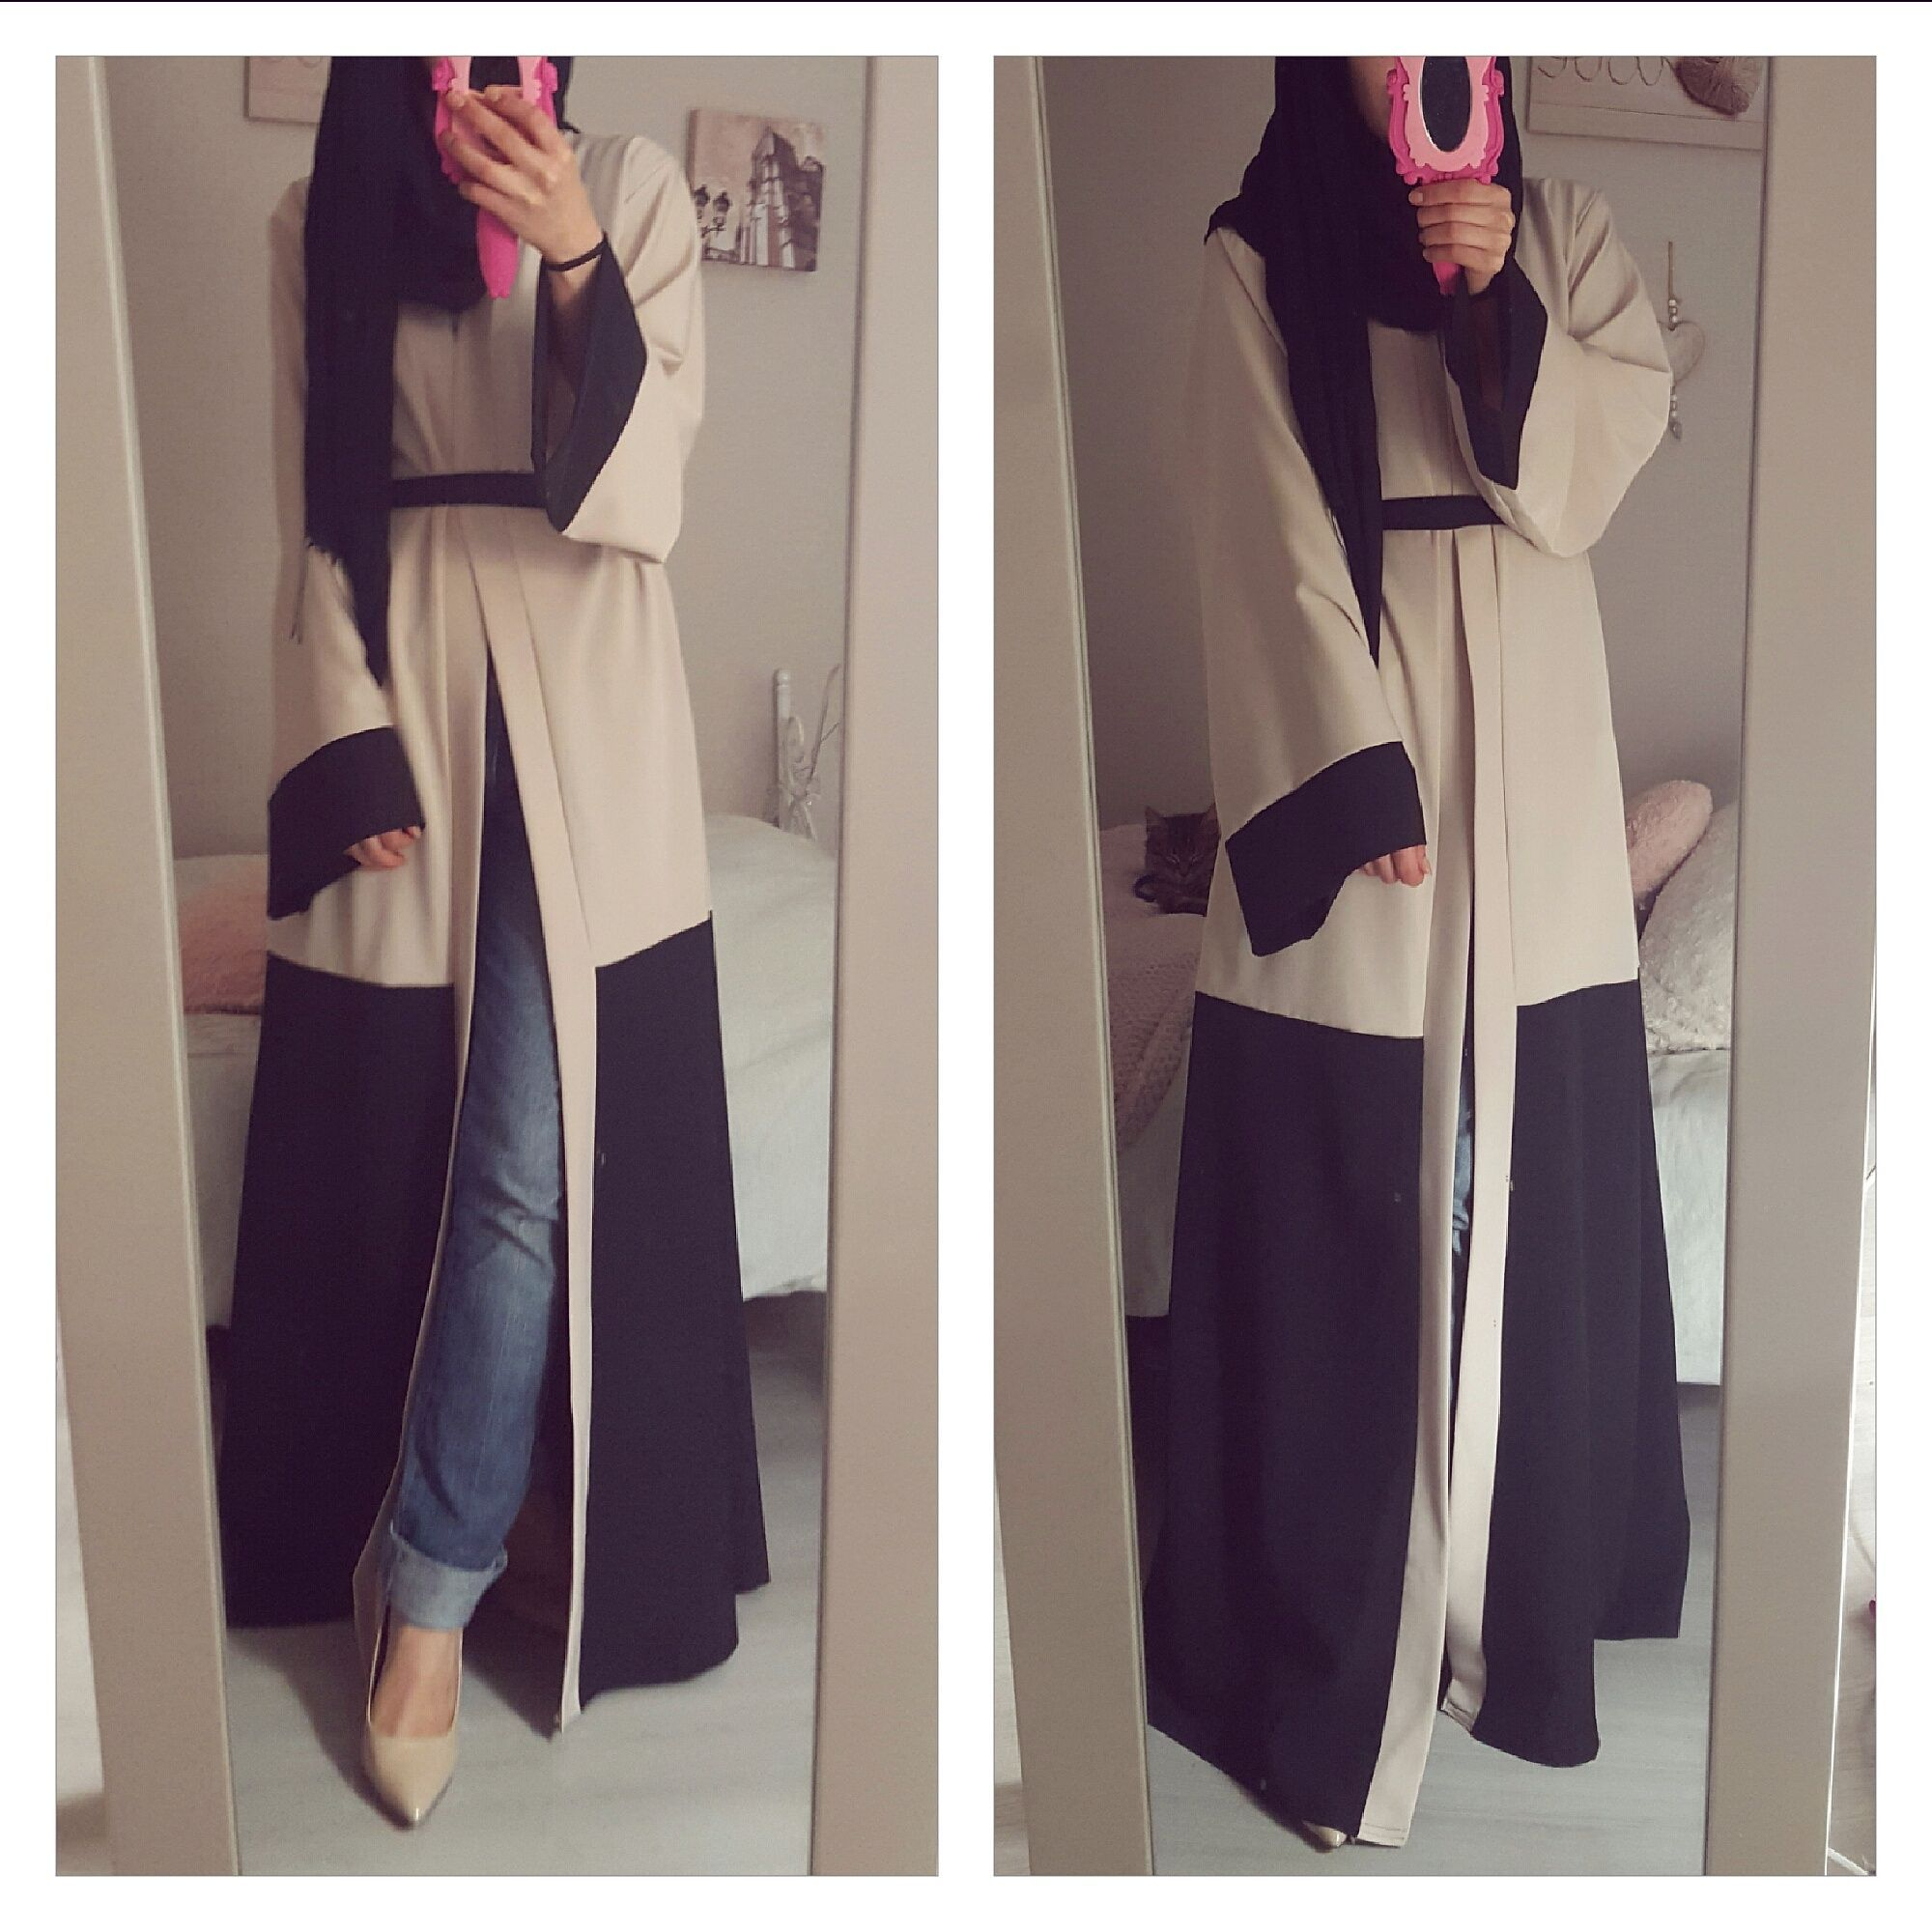 pin by reham on hijabi pinterest mode hijab abaya and. Black Bedroom Furniture Sets. Home Design Ideas